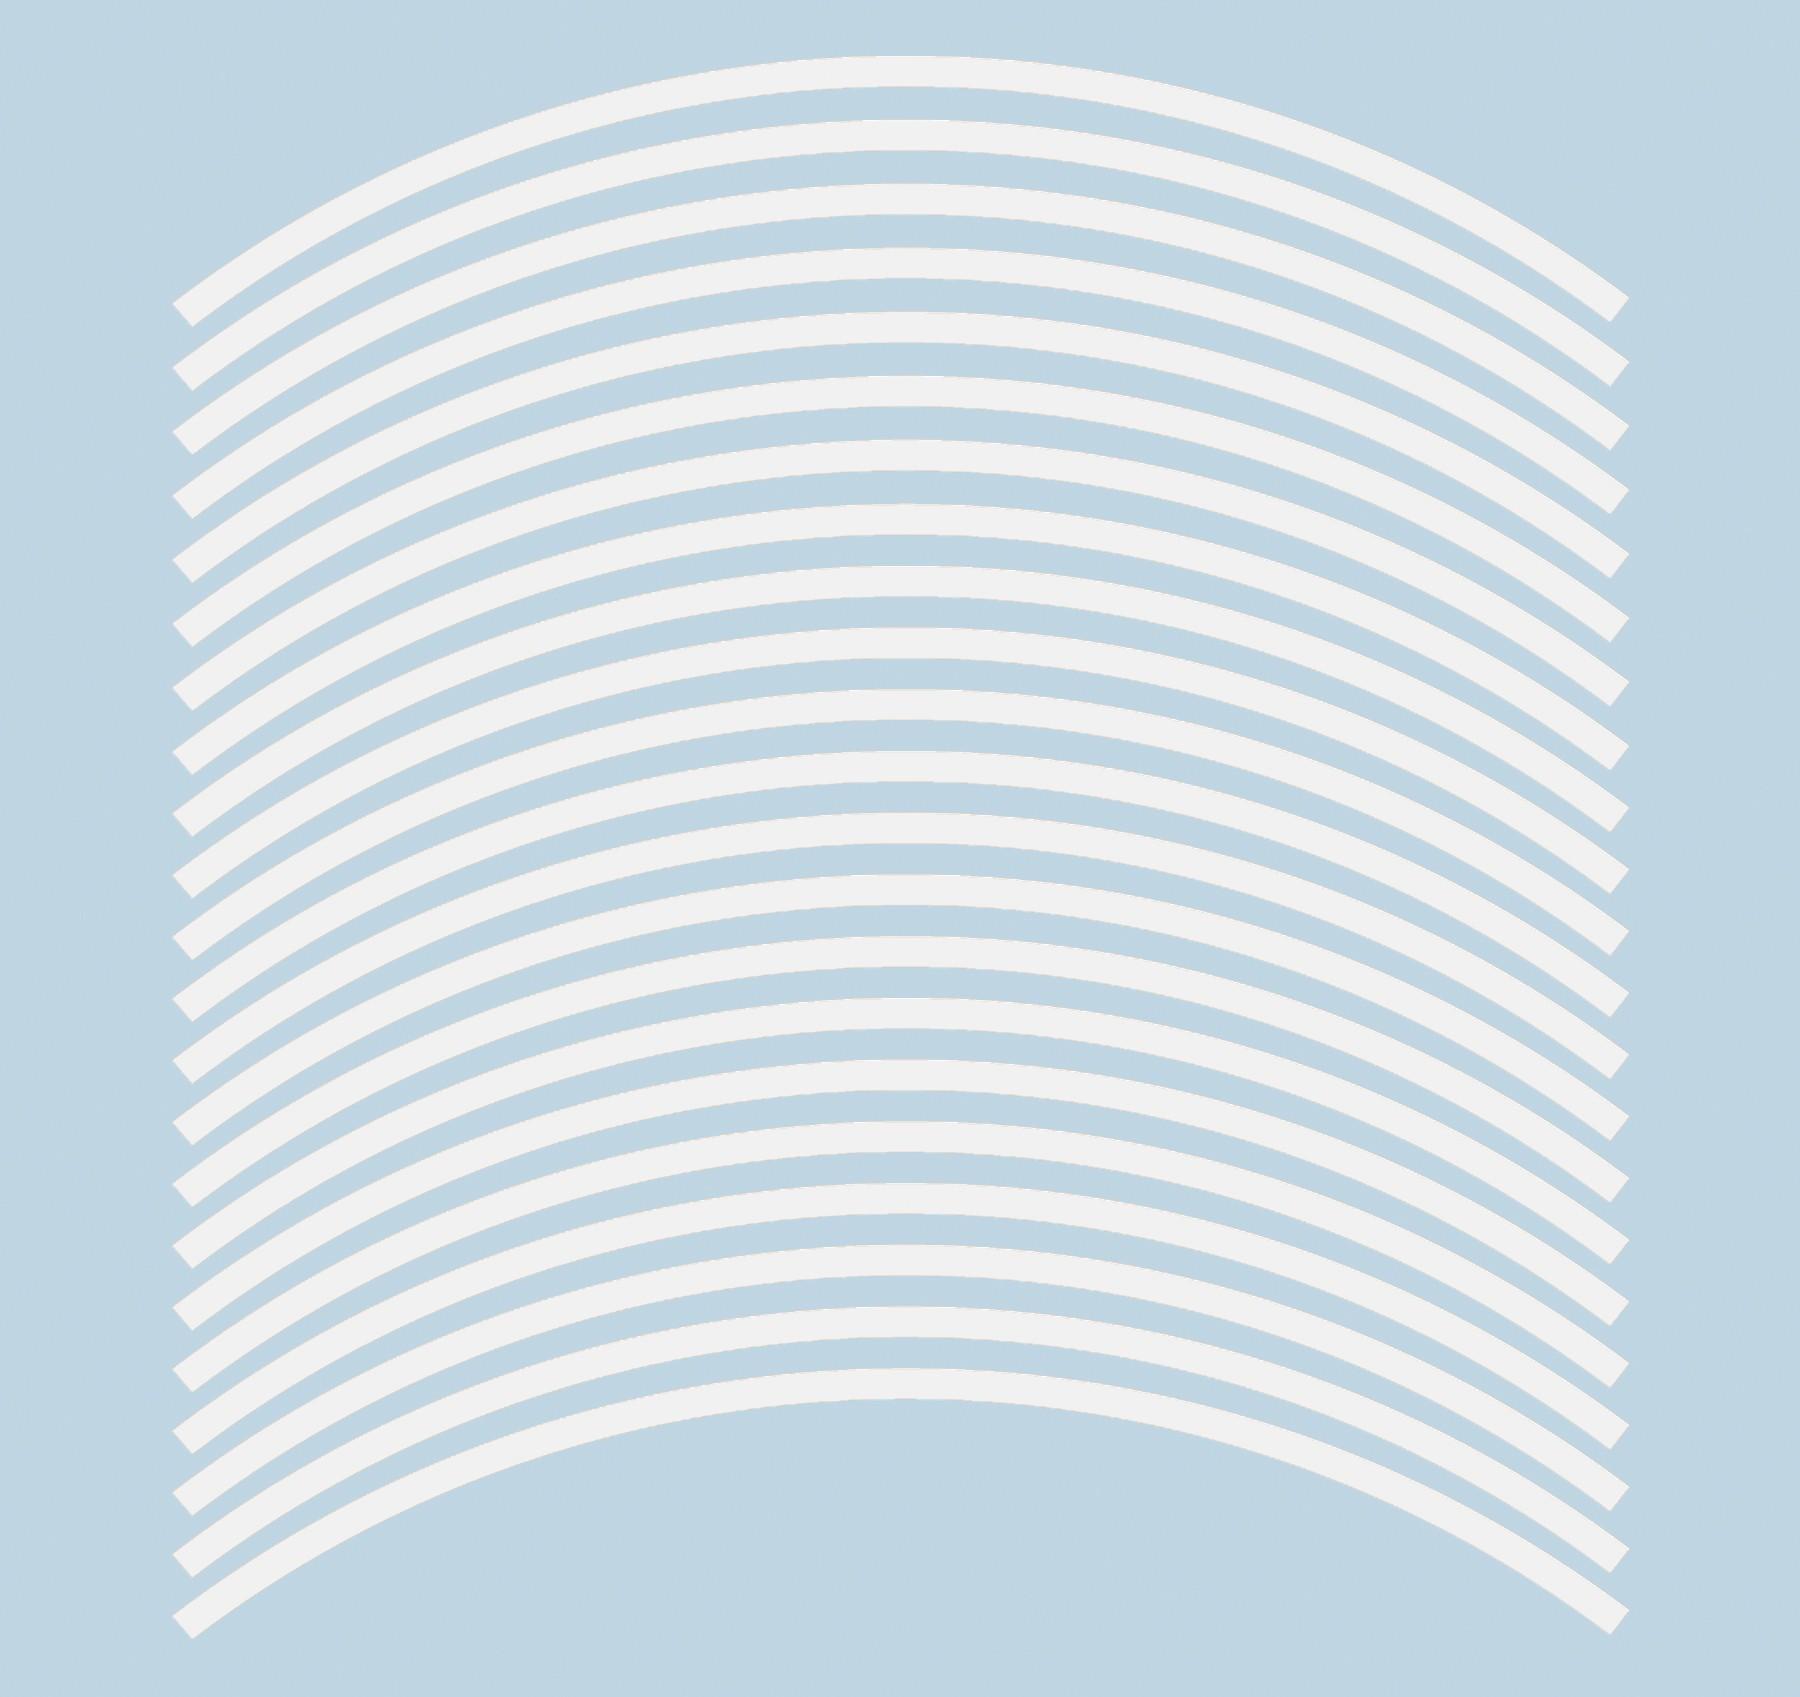 Felgenrandaufkleber 6 mm weiß 17 Zoll